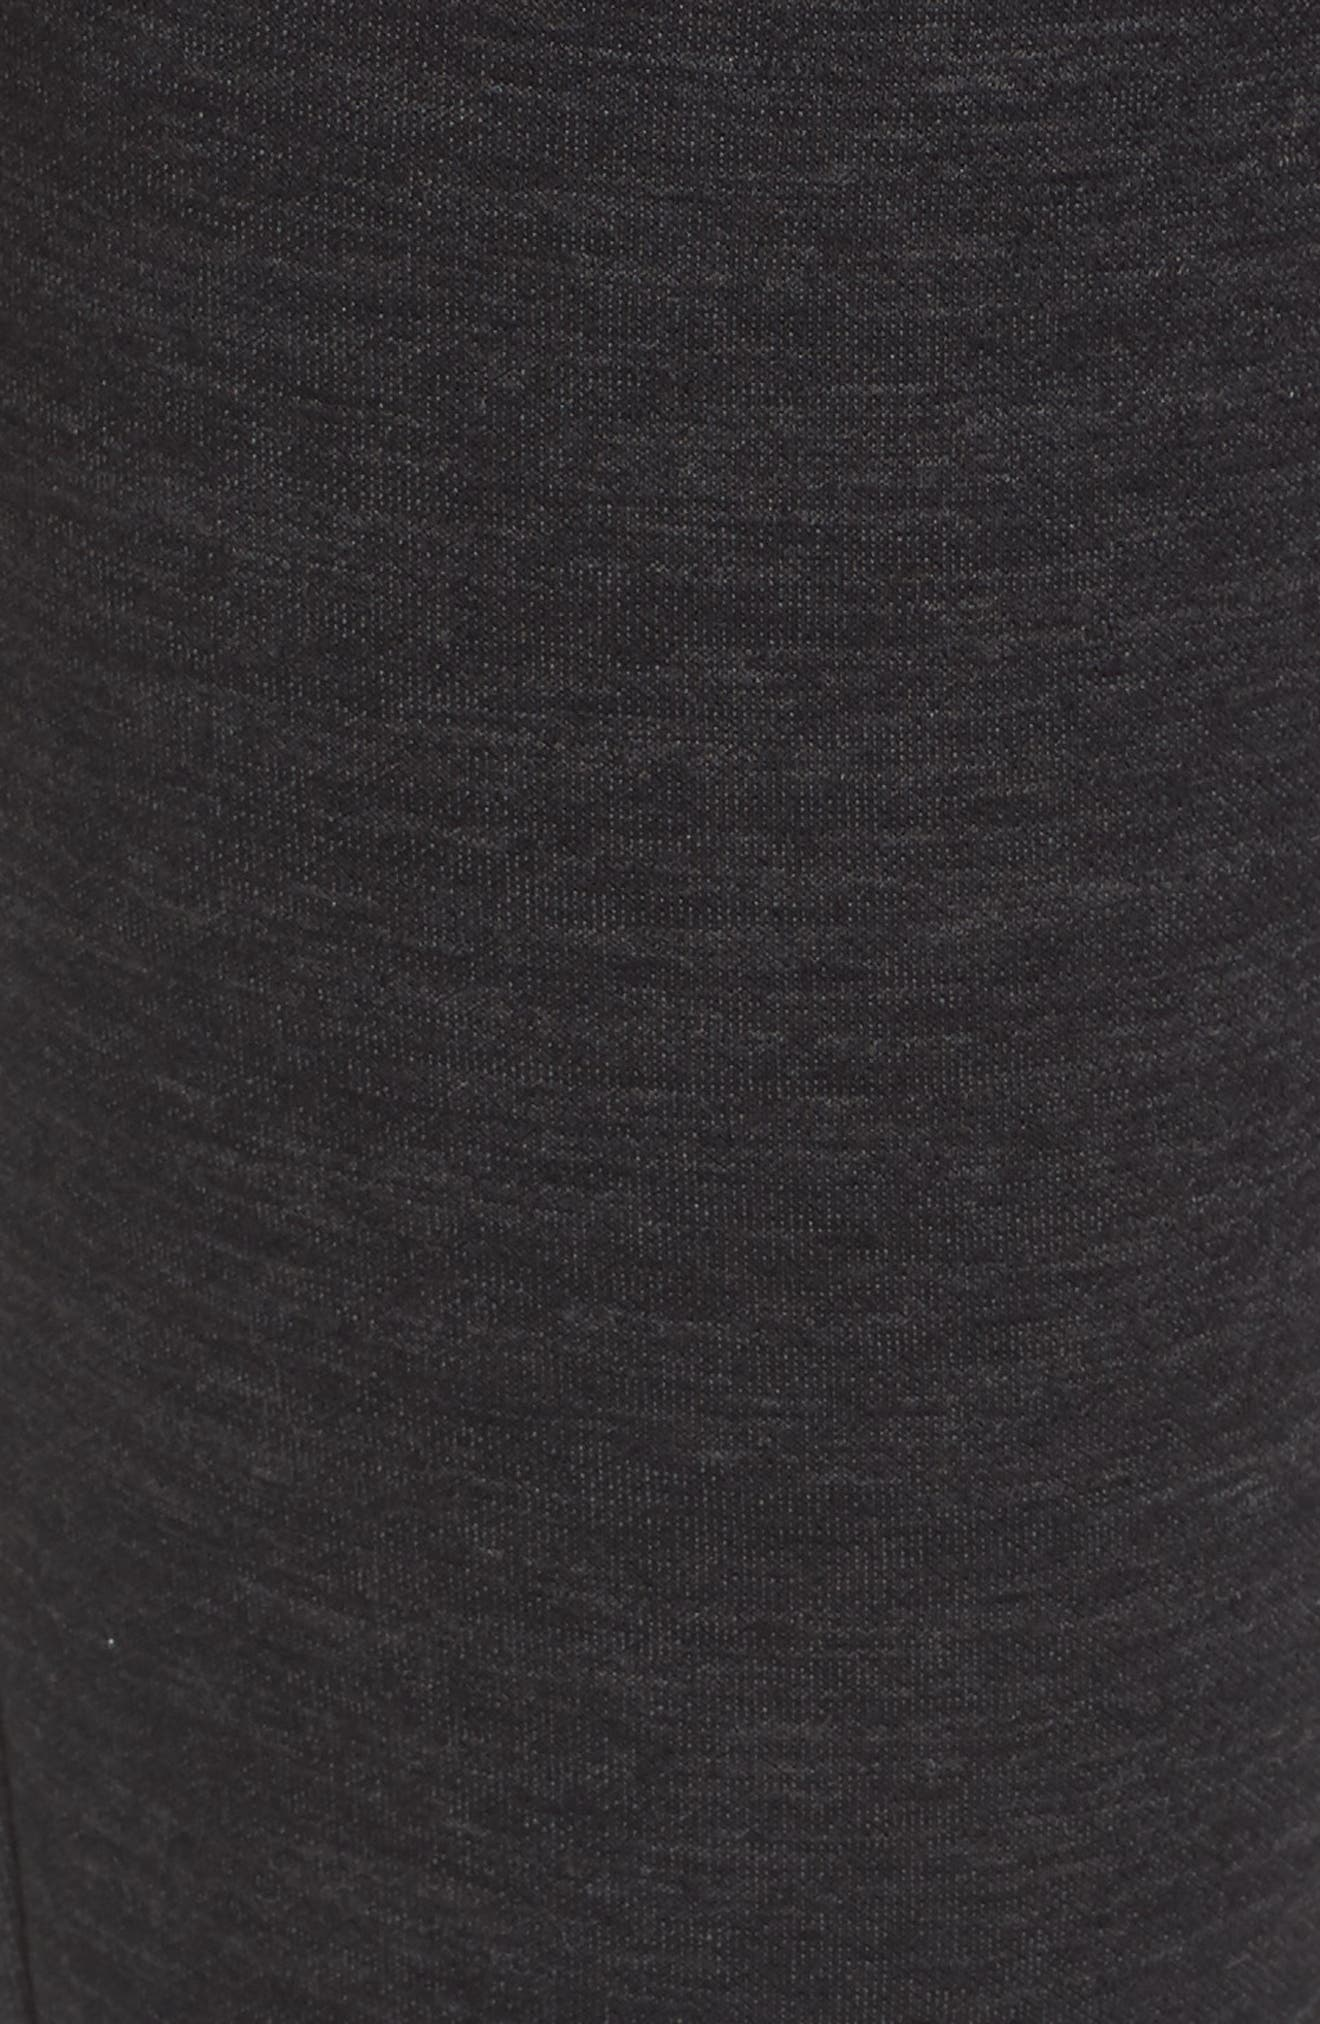 ID Slim Sweatpants,                             Alternate thumbnail 6, color,                             BLACK/ GREY FIVE